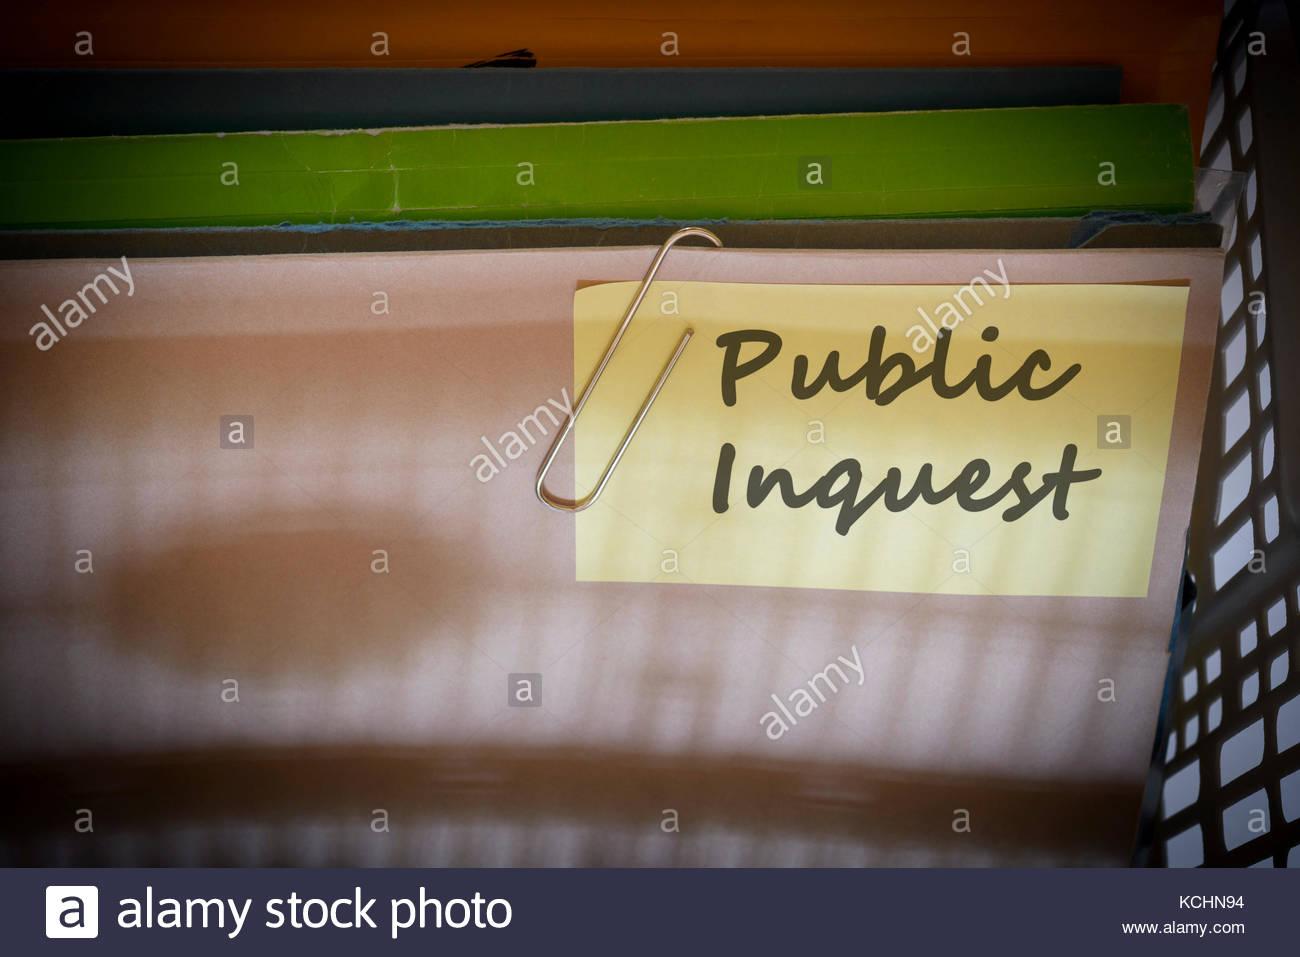 Public Inquest written on document folder, Dorset, England. - Stock Image